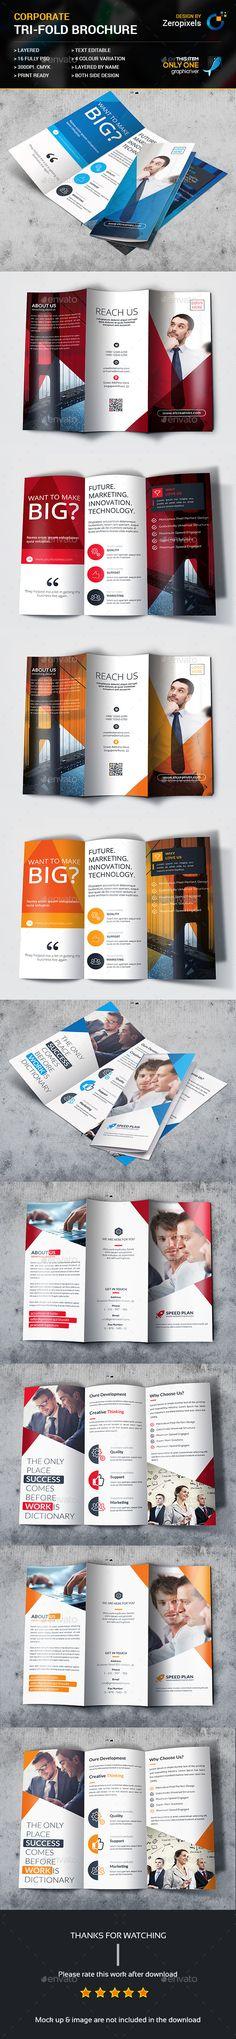 Trifold Brochure Templates PSD Bundle